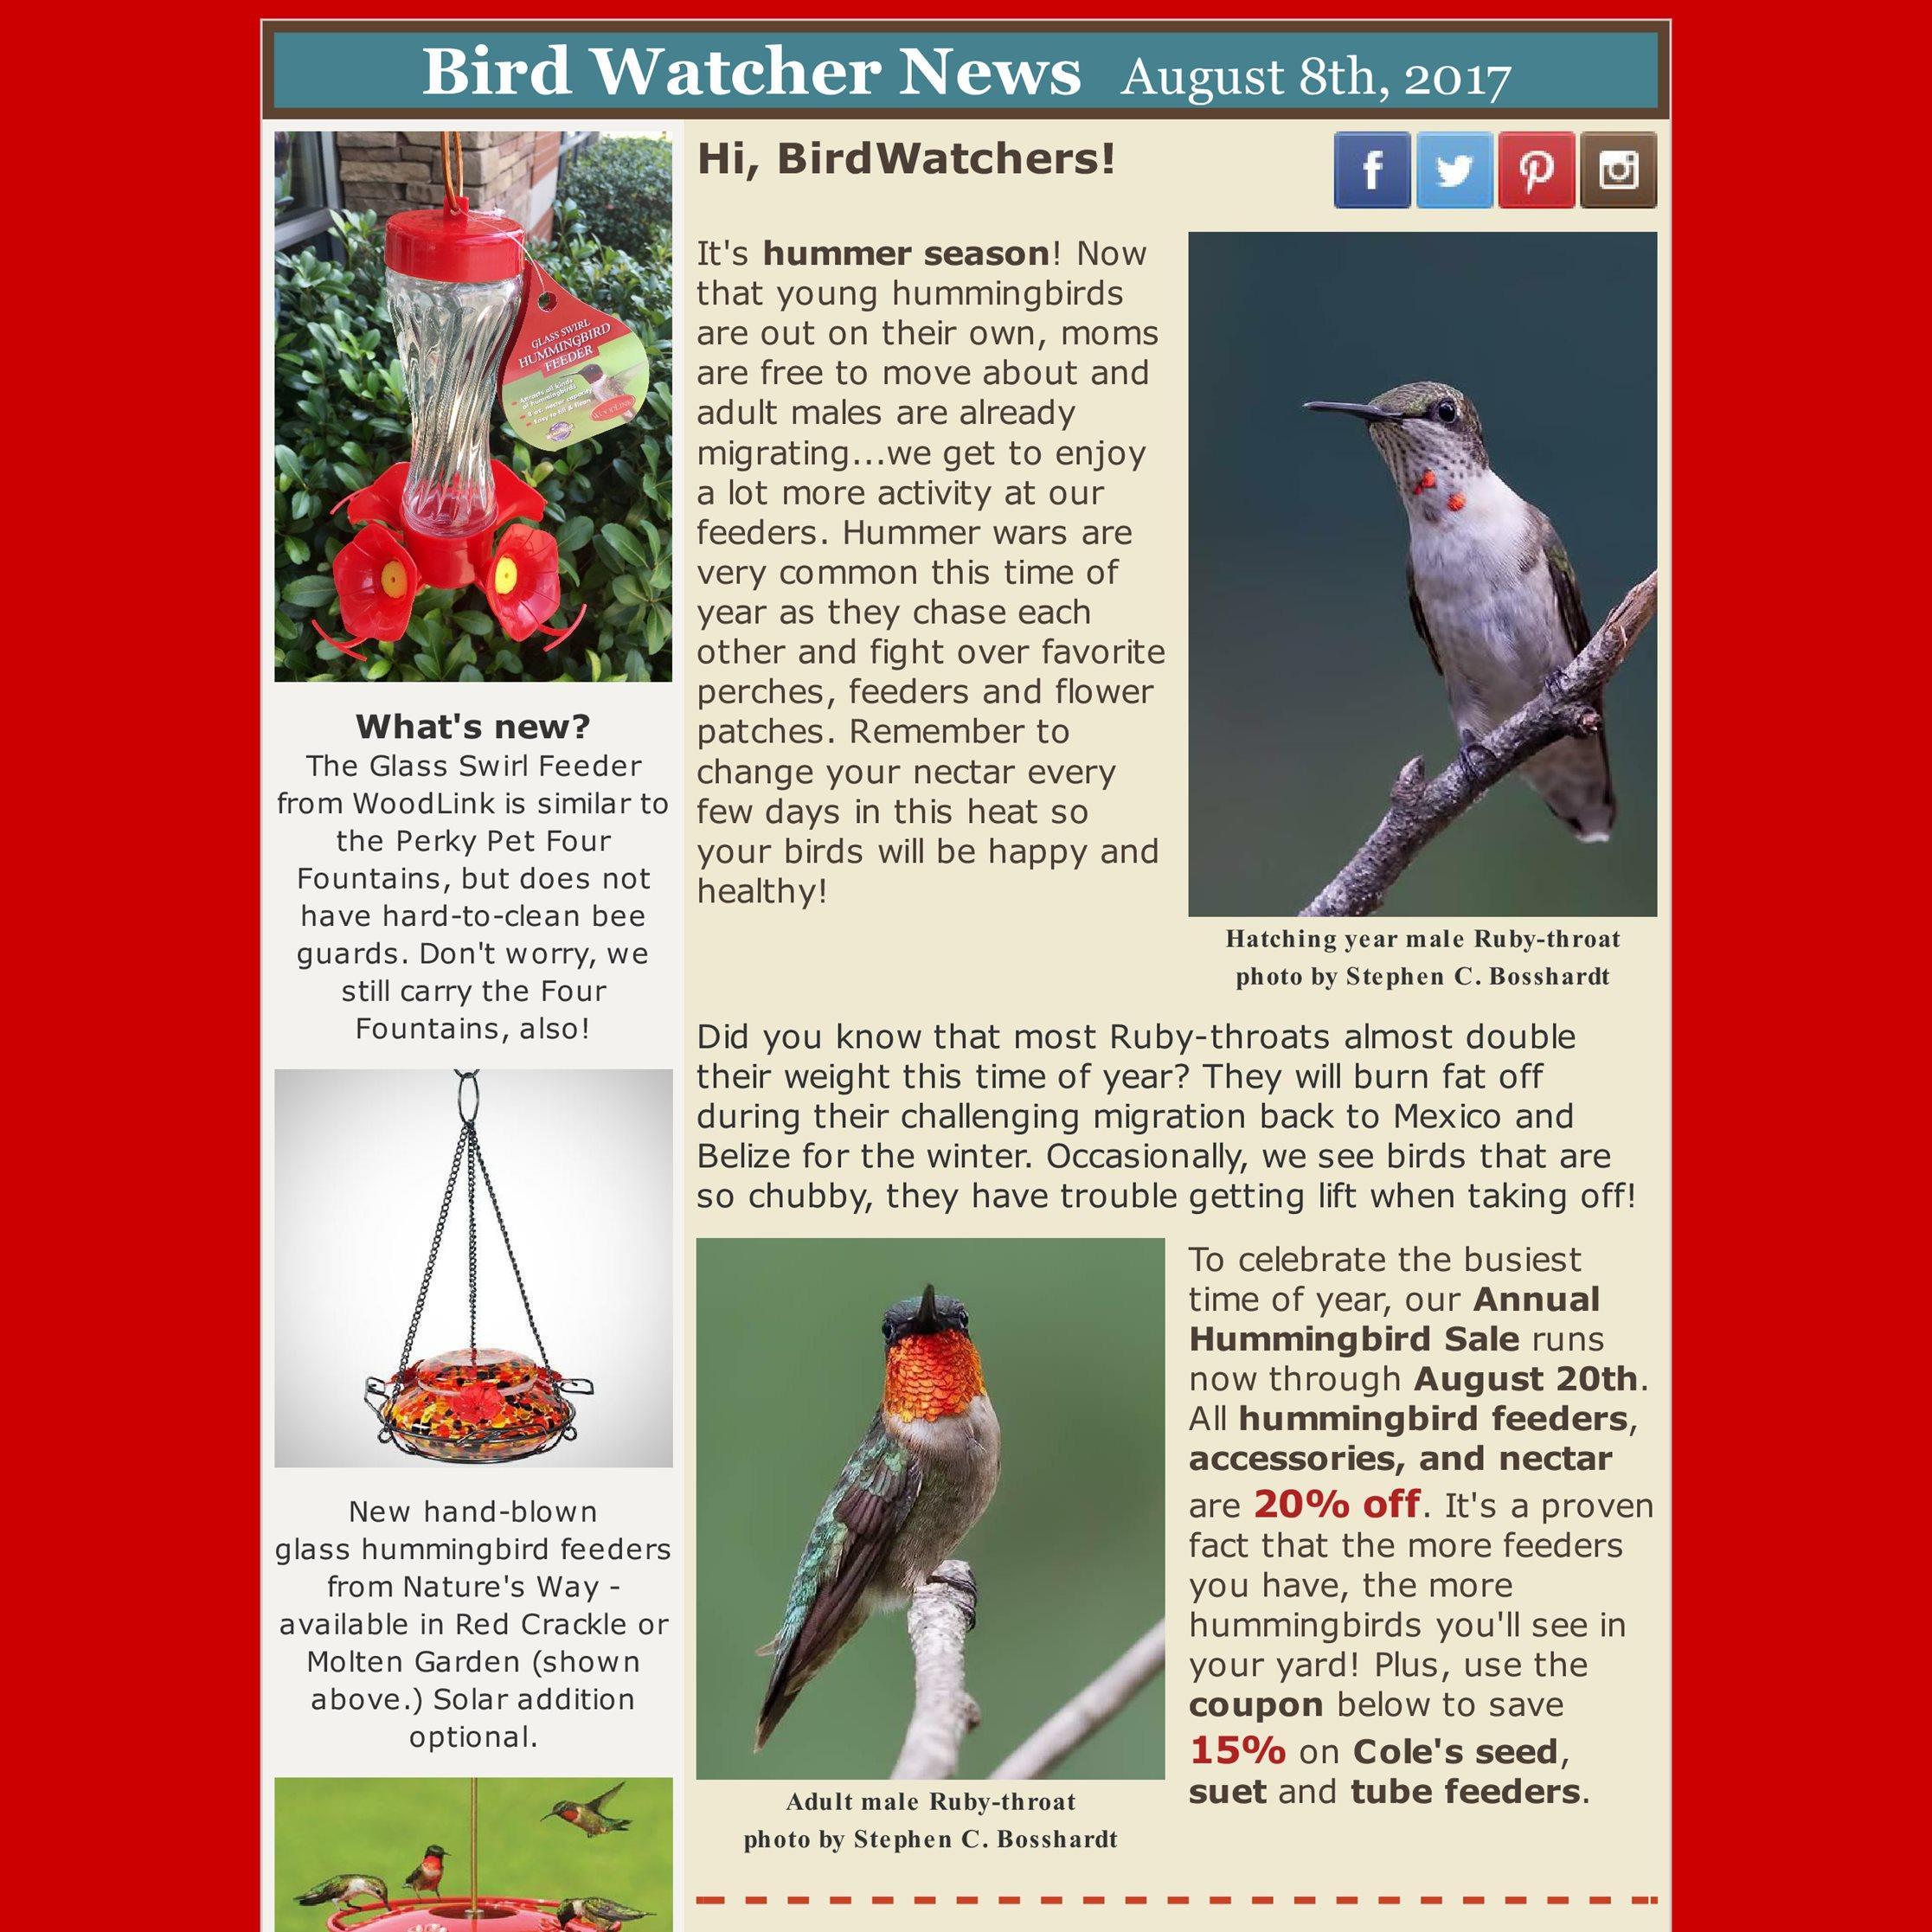 shop local, hummingbirds, sale, coupon, hummingbird feeders, nectar, ruby-throat, event, banding, migration